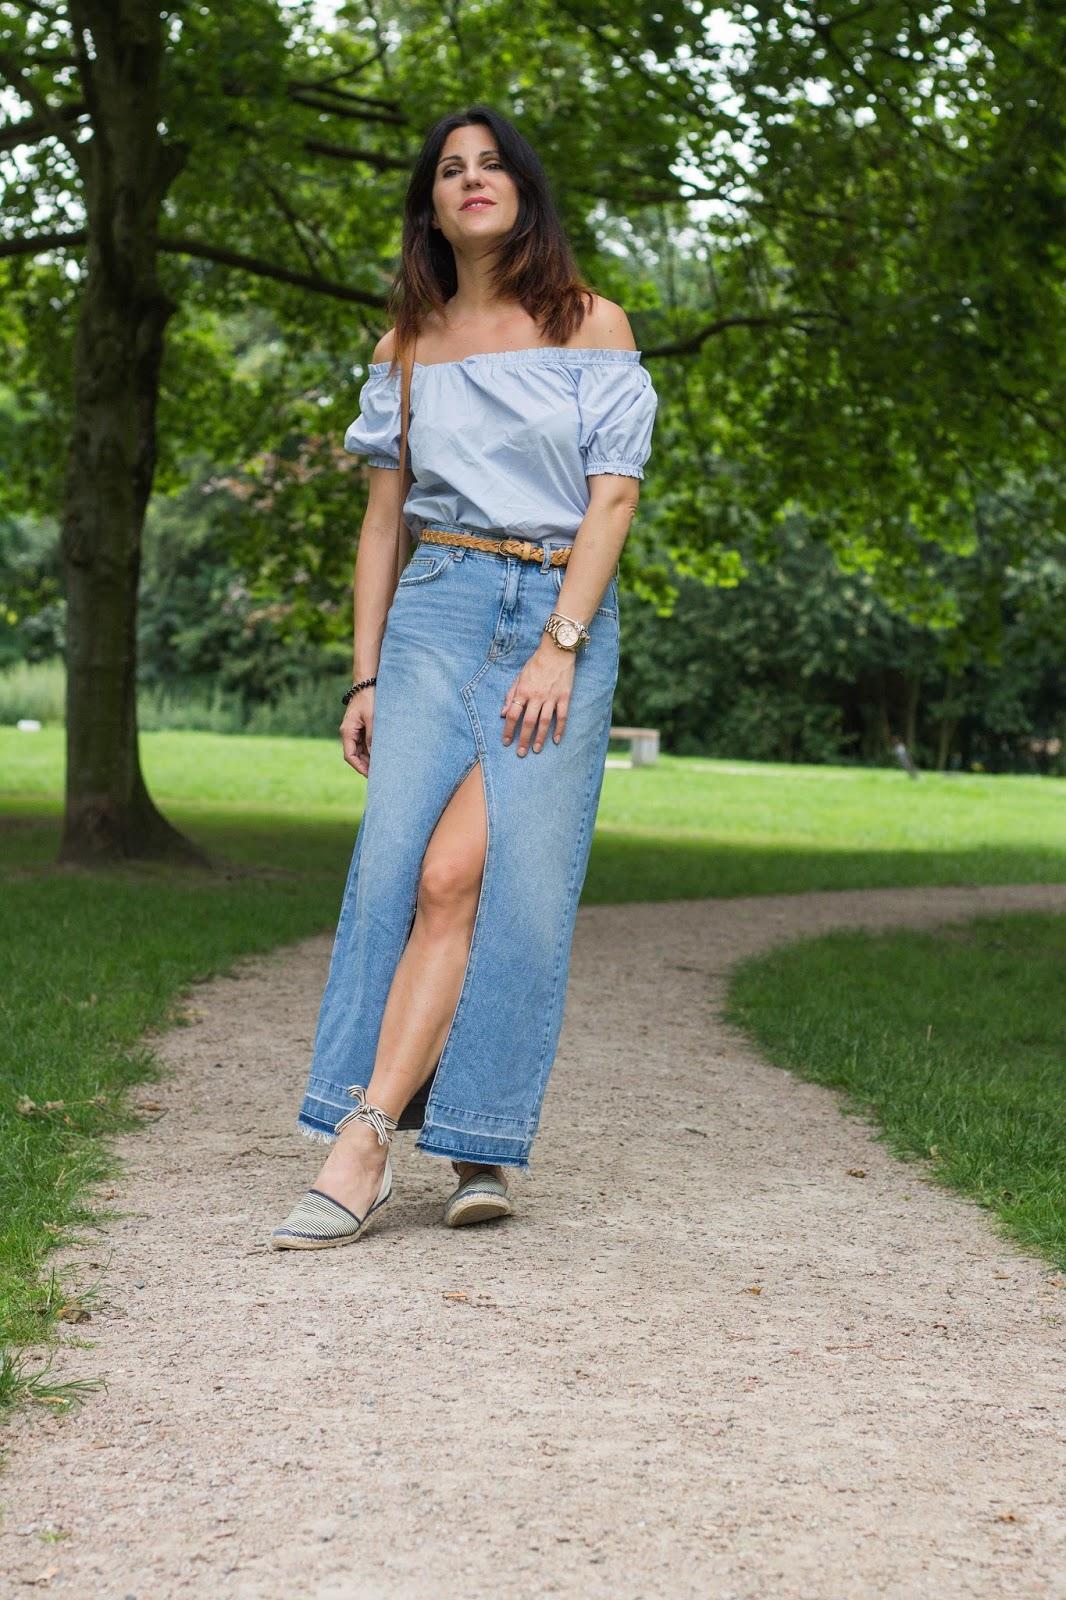 http://fashionavenueabc.blogspot.de/2016/08/long-denim-skirt.html